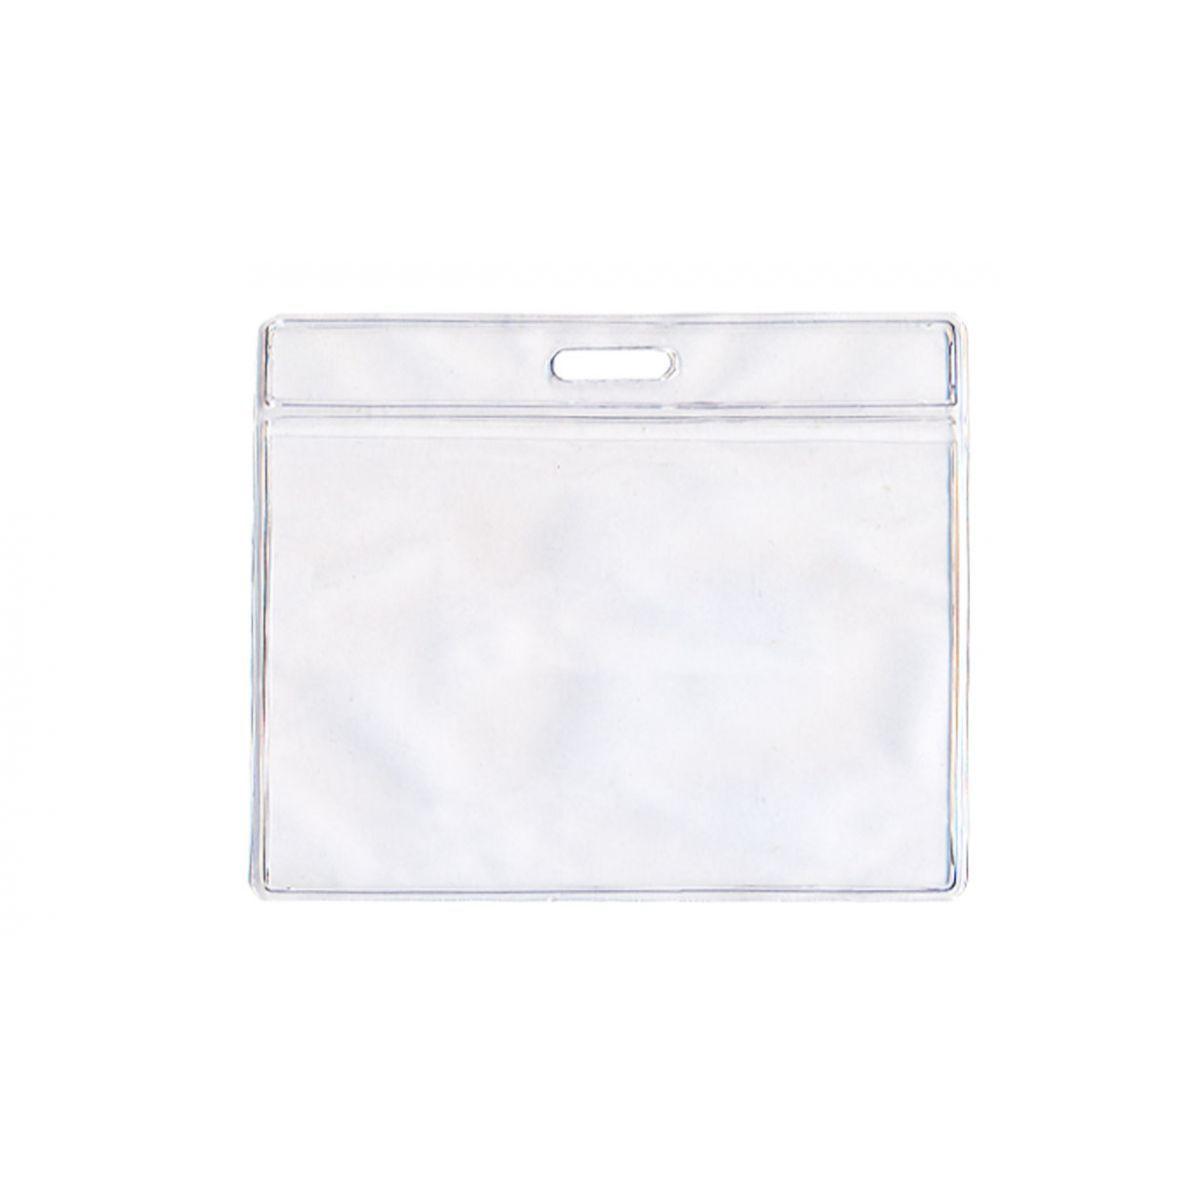 Kit 500 Protetores Porta Crachá em Bolsa PVC Cristal Horizontal 58x89x0,20mm  - Click Suprimentos